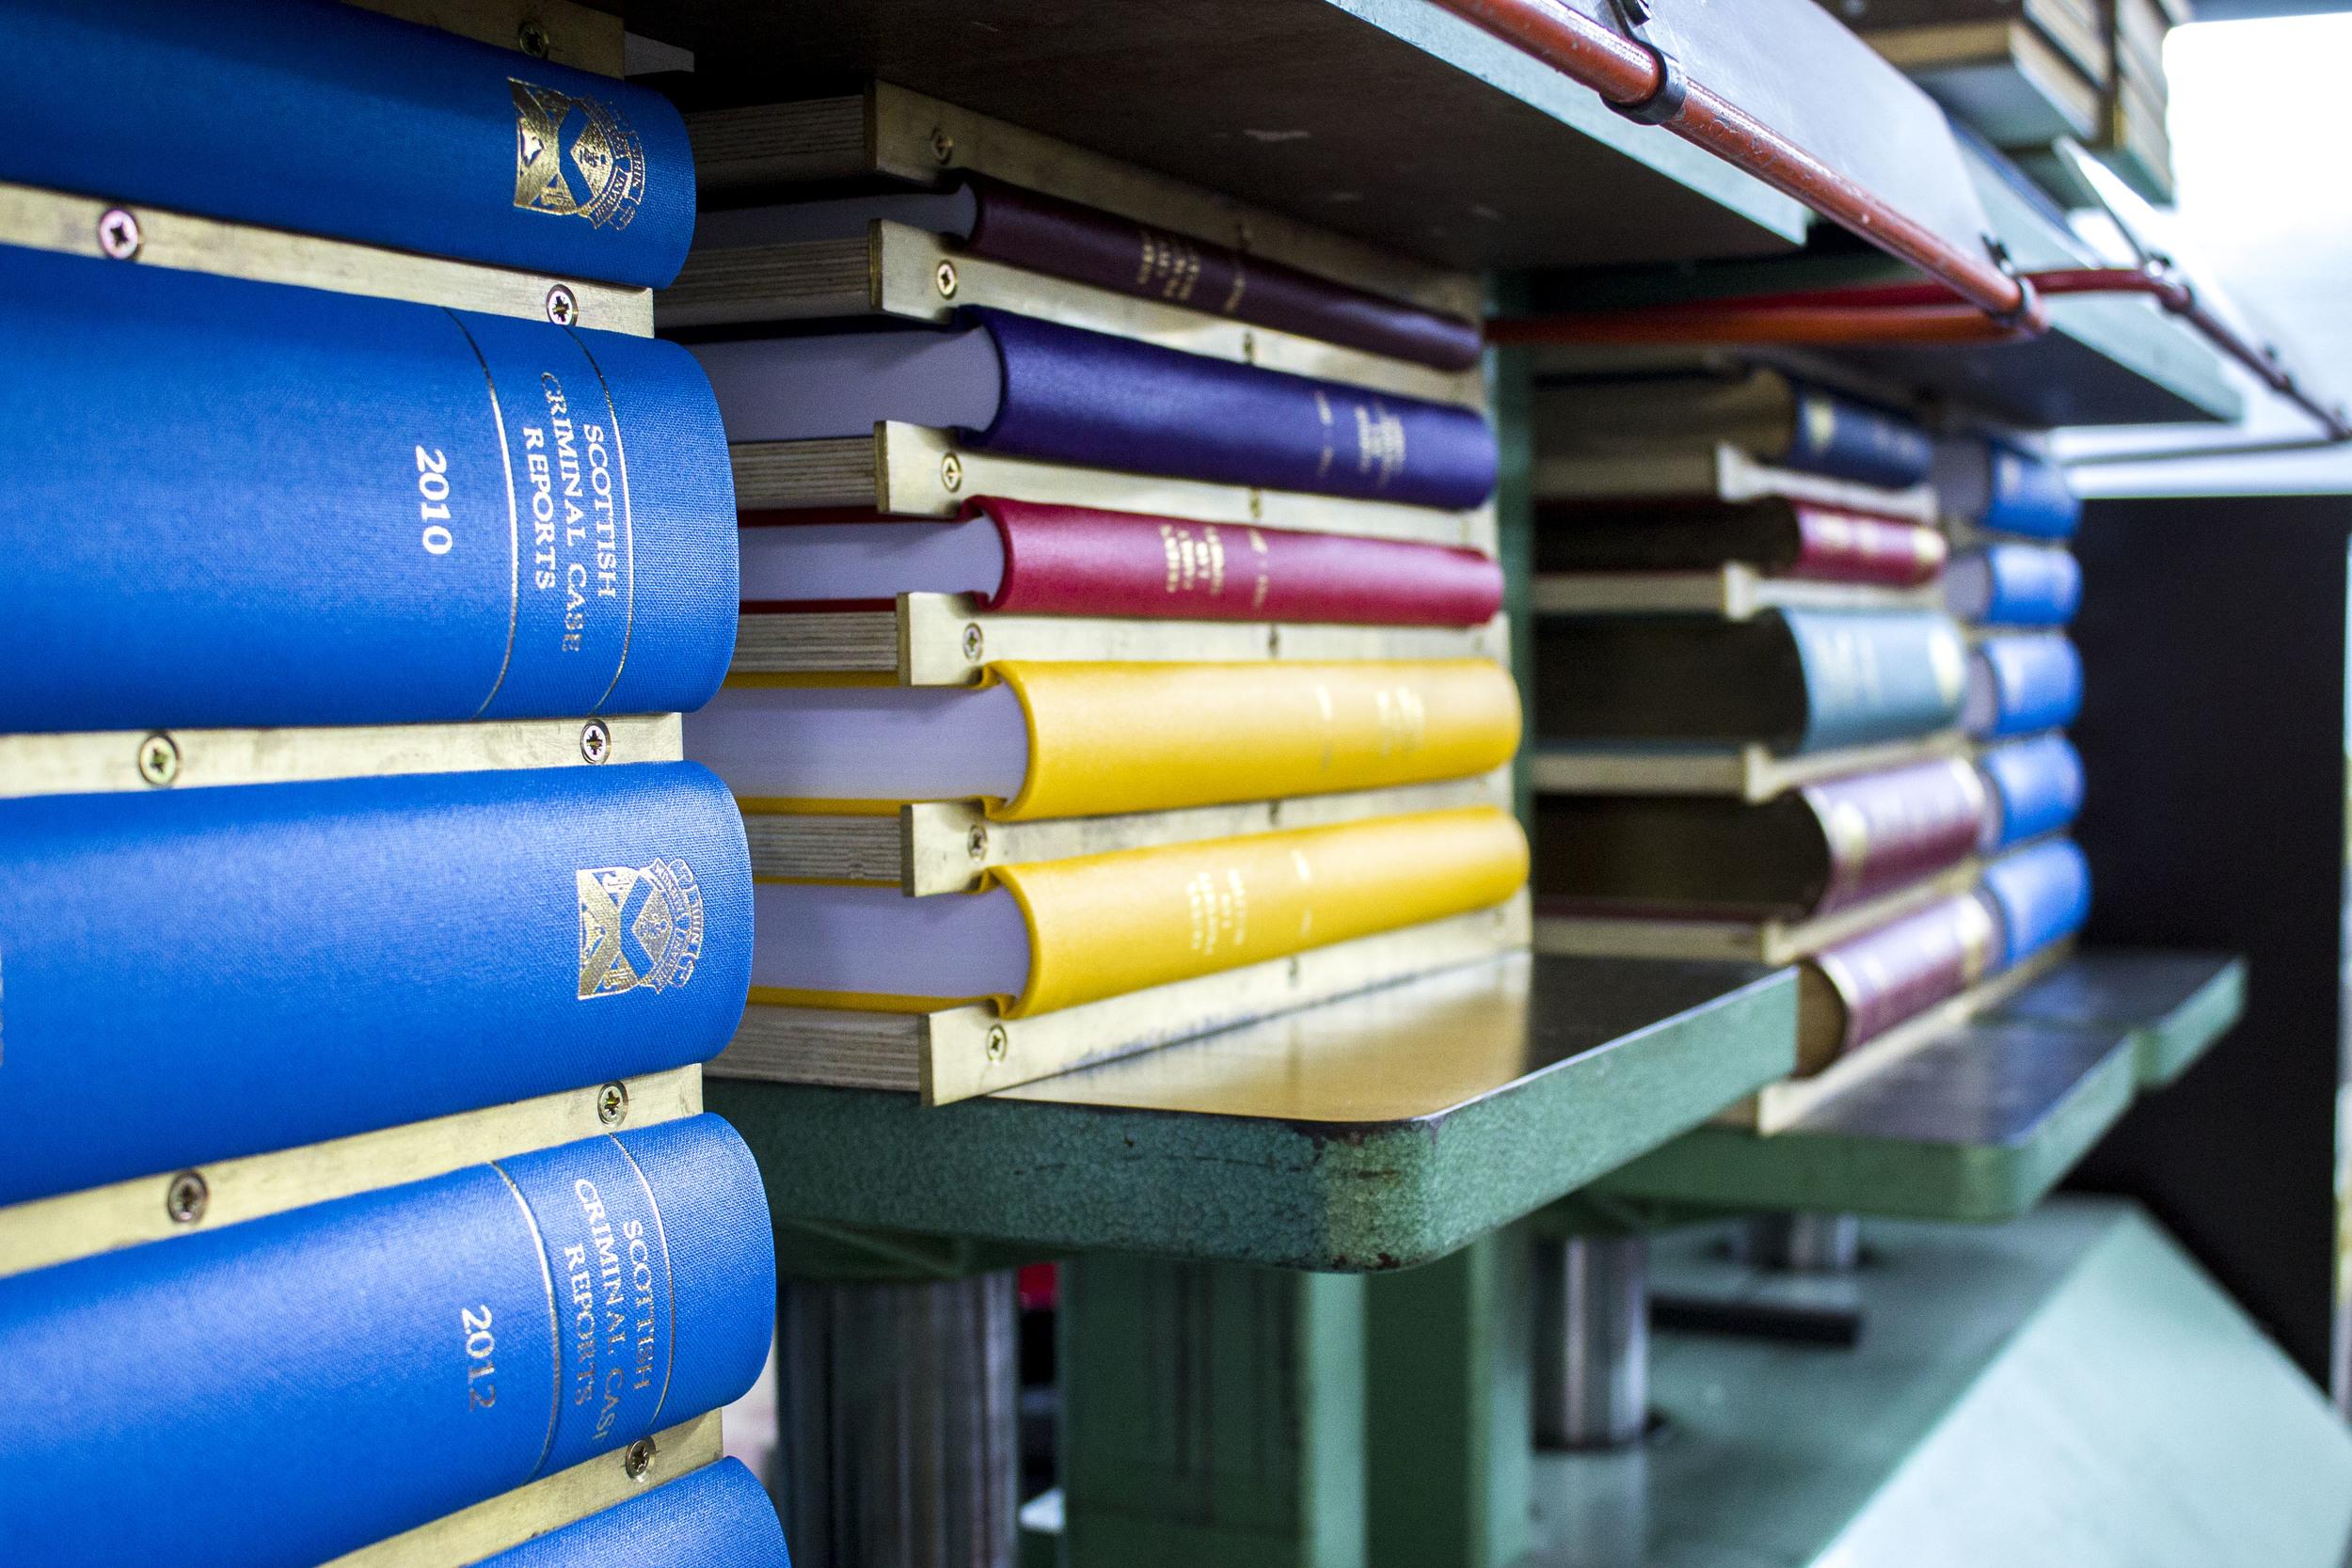 Periodical books in press